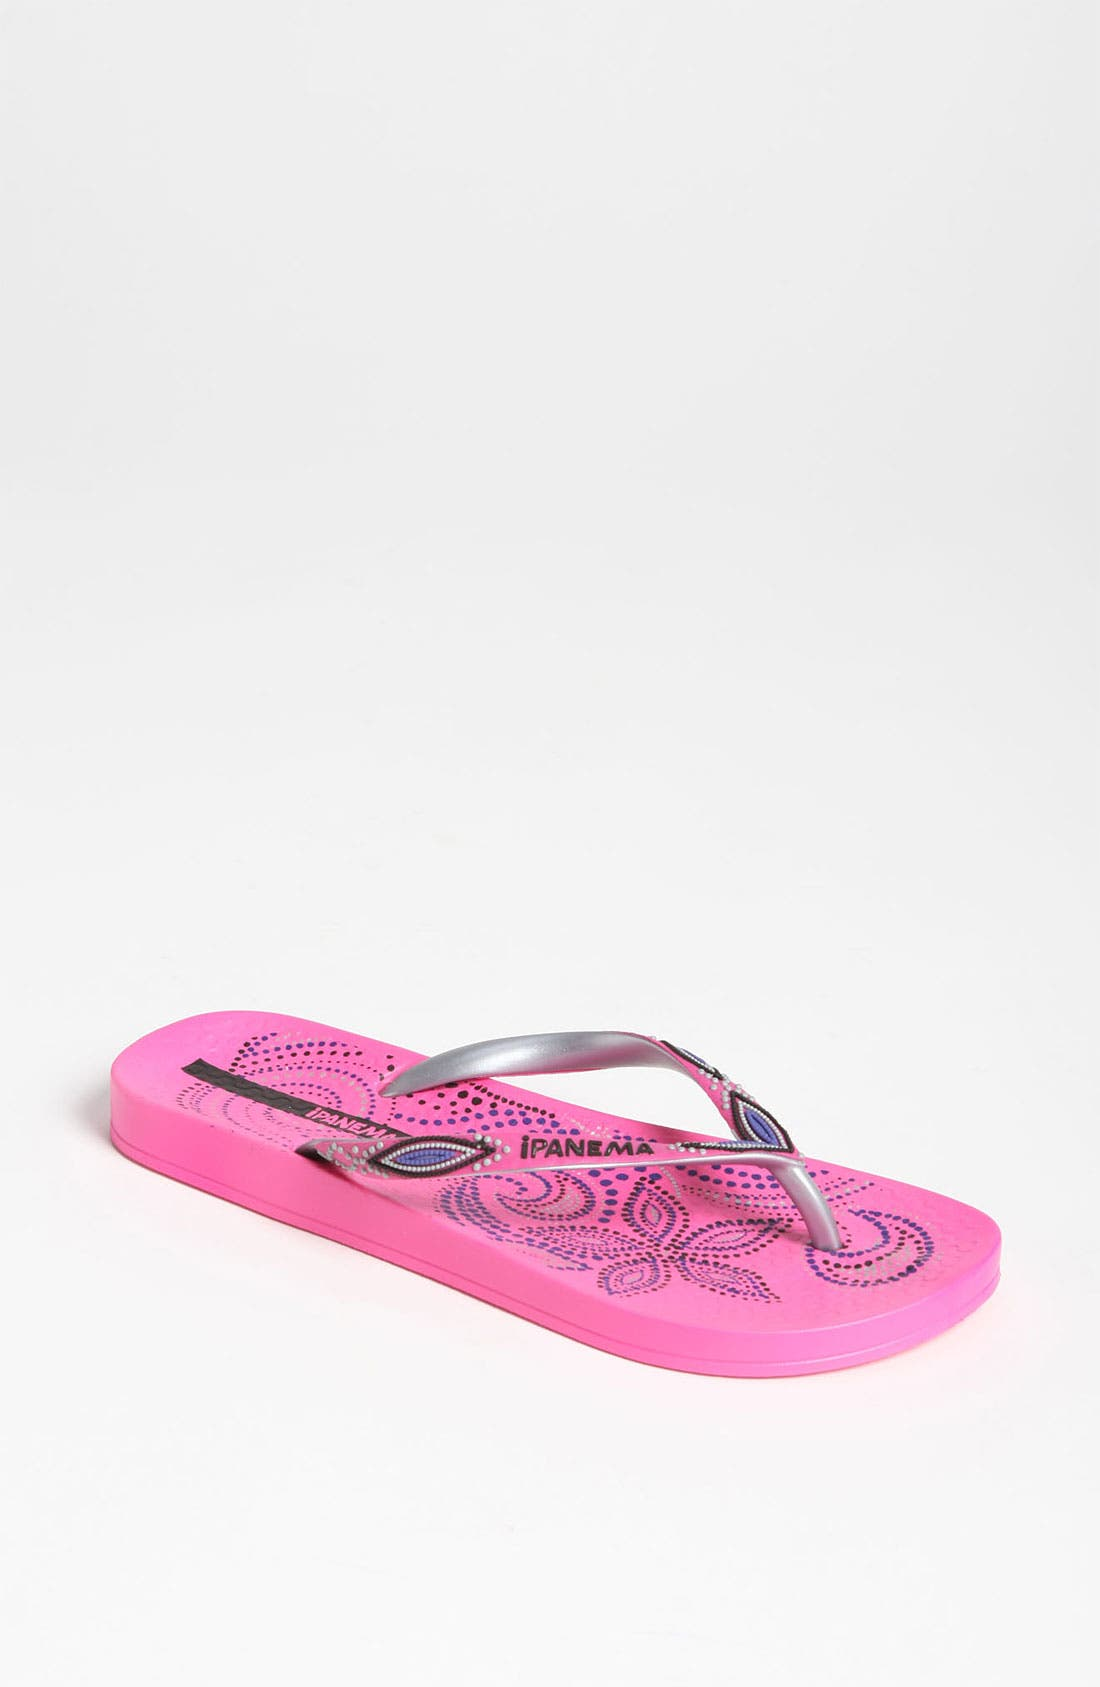 Main Image - Ipanema 'Henna' Flip Flop